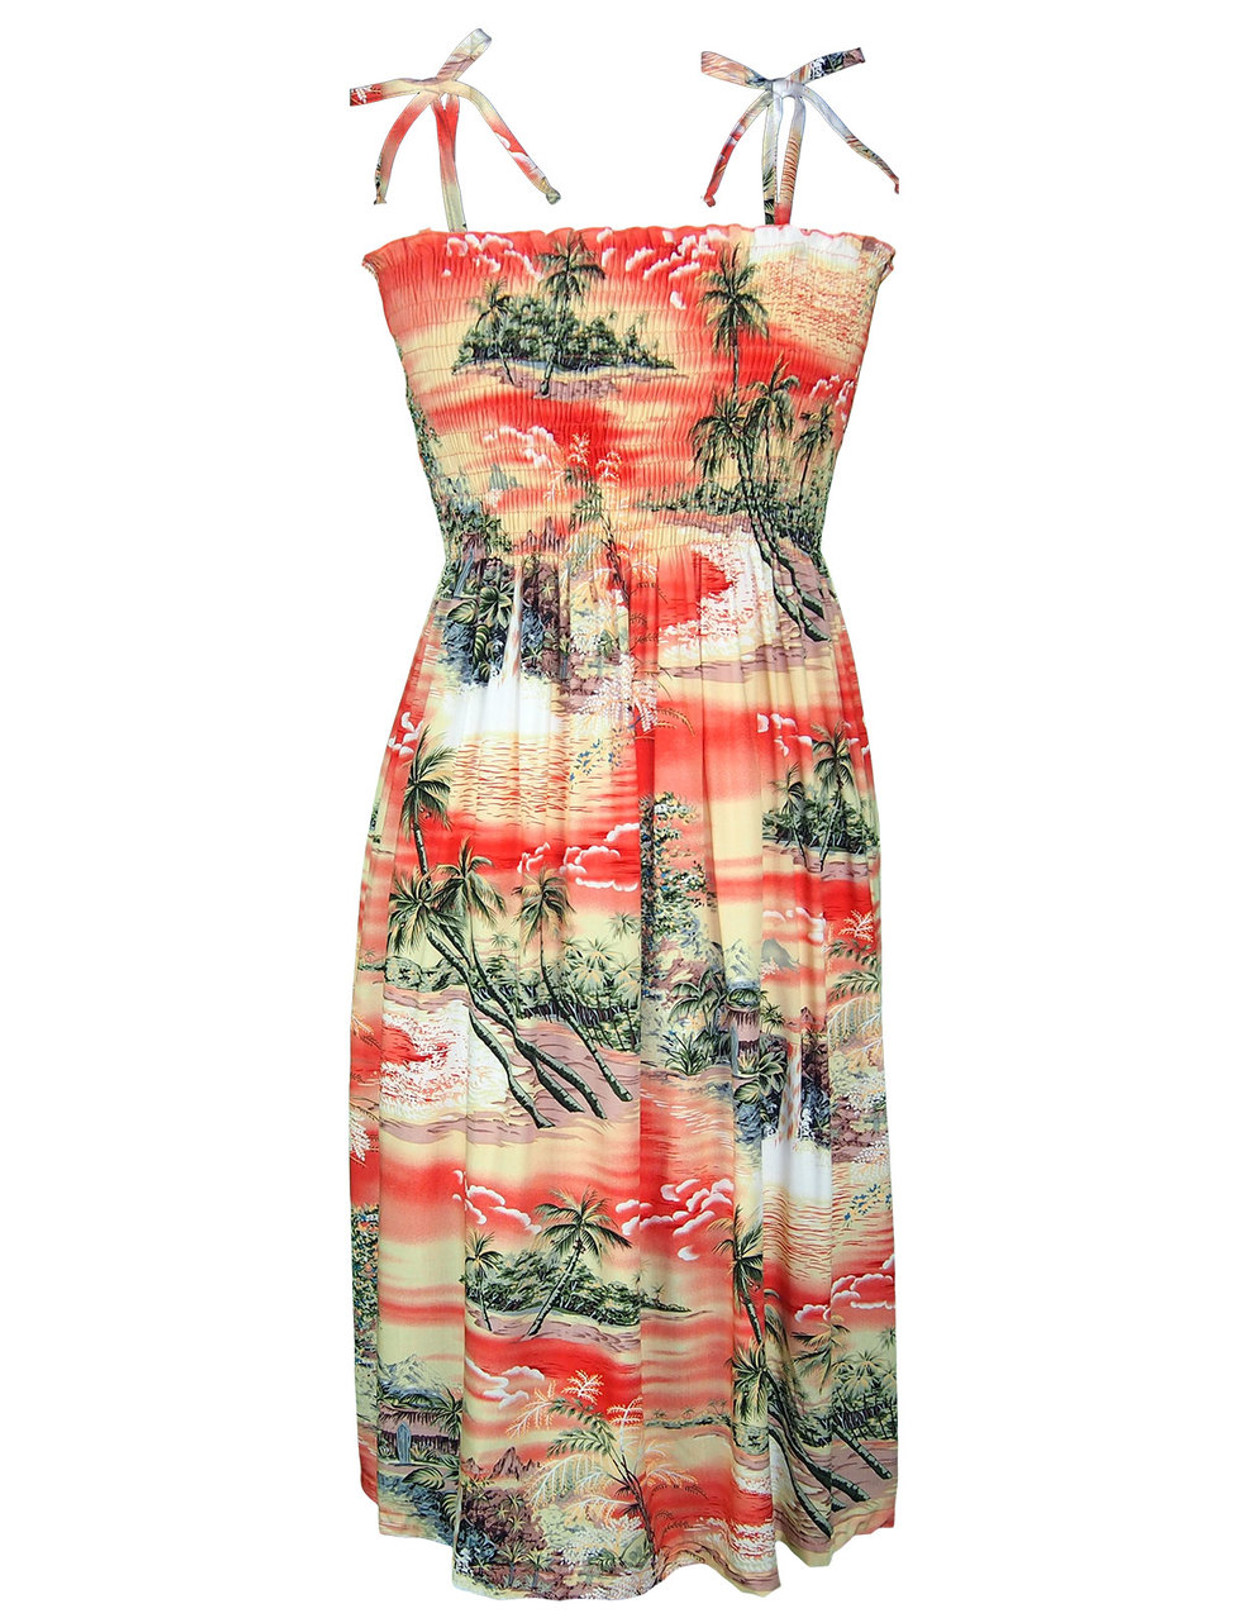 2e945bba4fb5 Knee Length Smock Aloha Dress Island Paradise 100% Rayon Fabric Smocked  Tube Top Design Knee